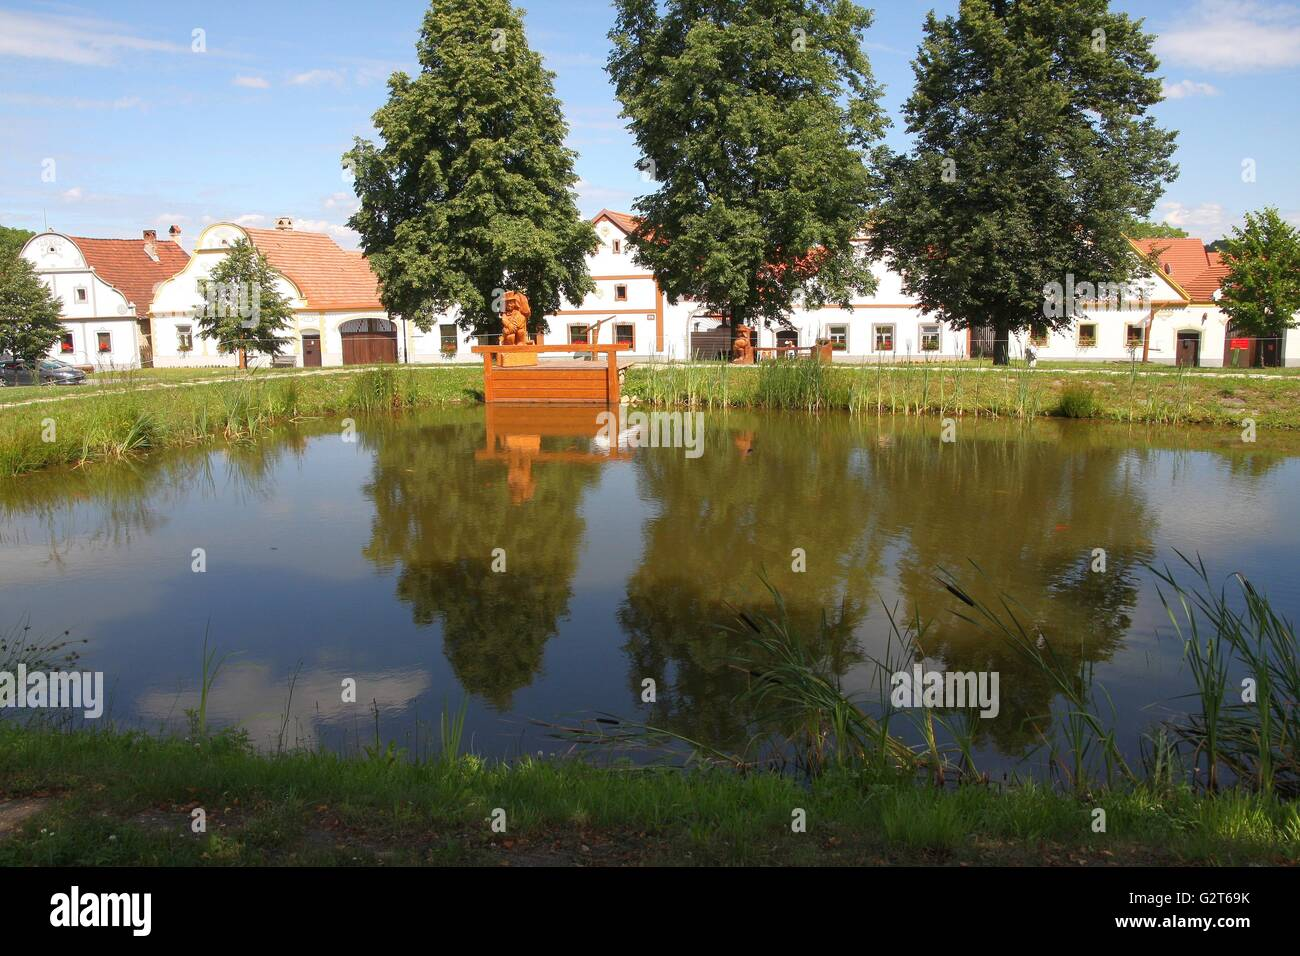 Holasovice - village from the UNESCO list, Czech Republic - Stock Image